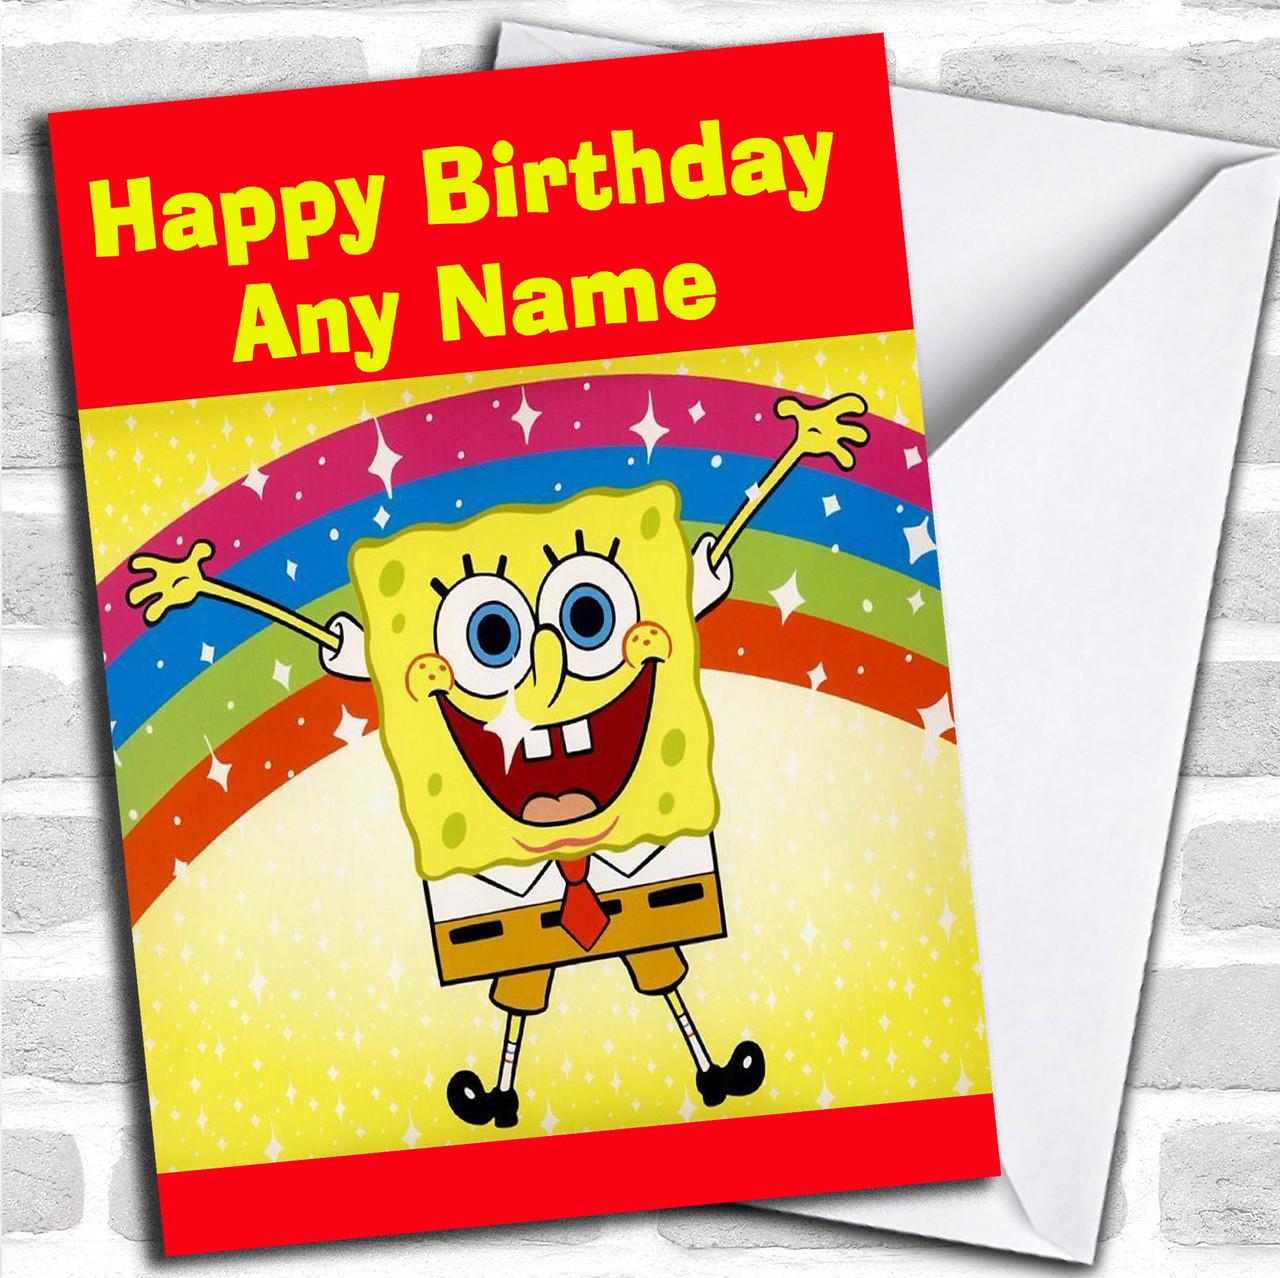 photograph about Printable Children's Birthday Cards named SpongeBob Squarepants Rainbow Tailored Childrens Birthday Card